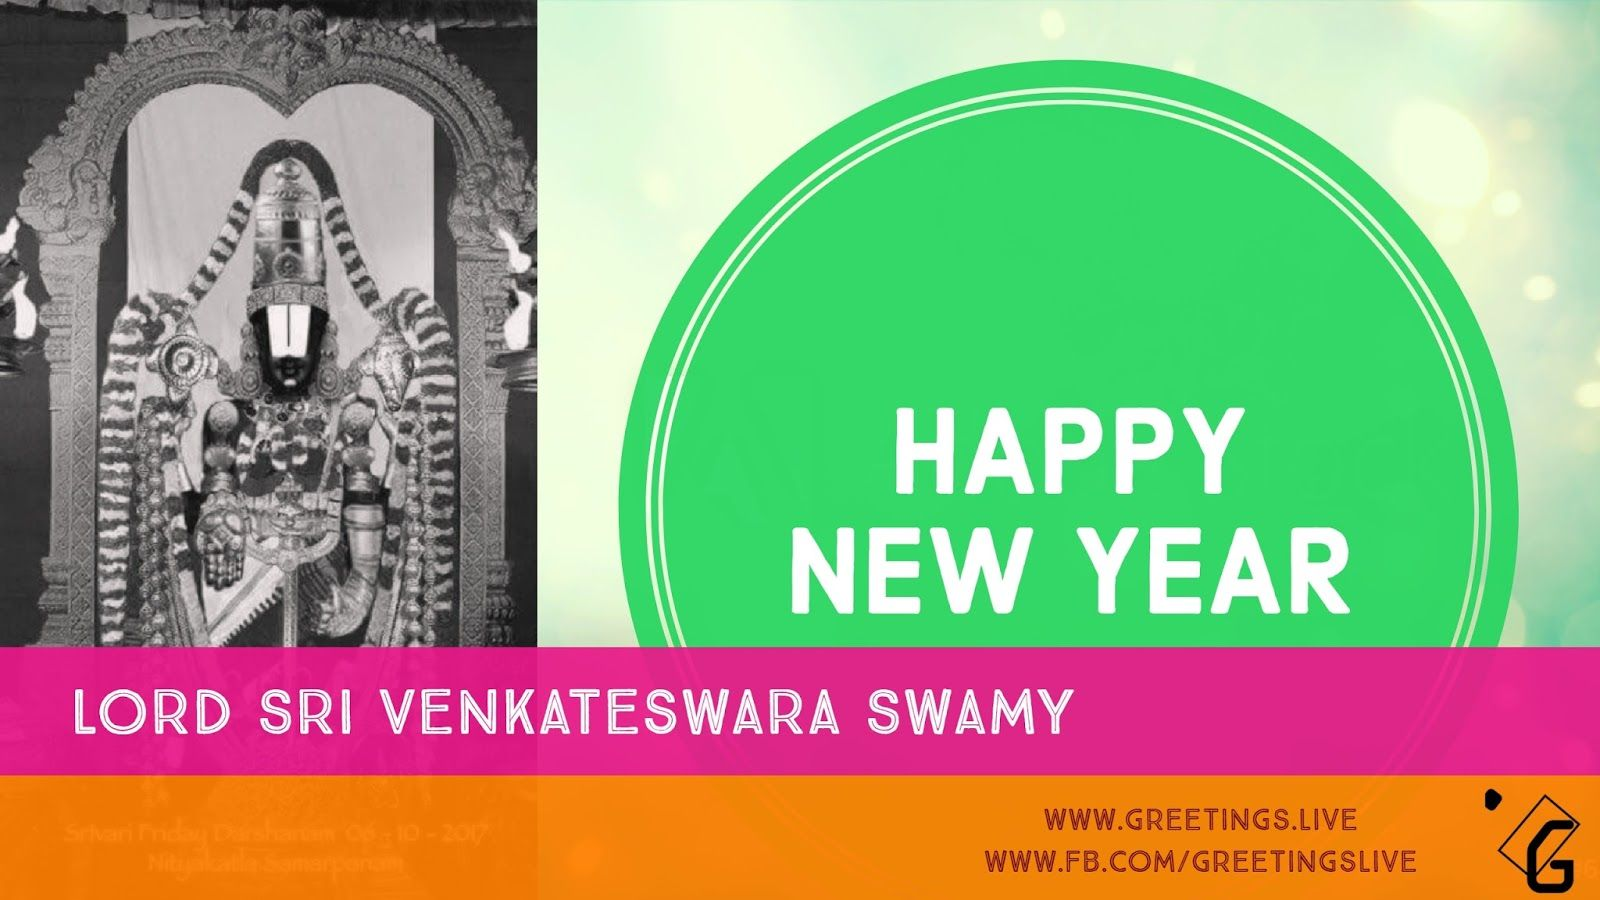 sri venkateswara new year greetings hd